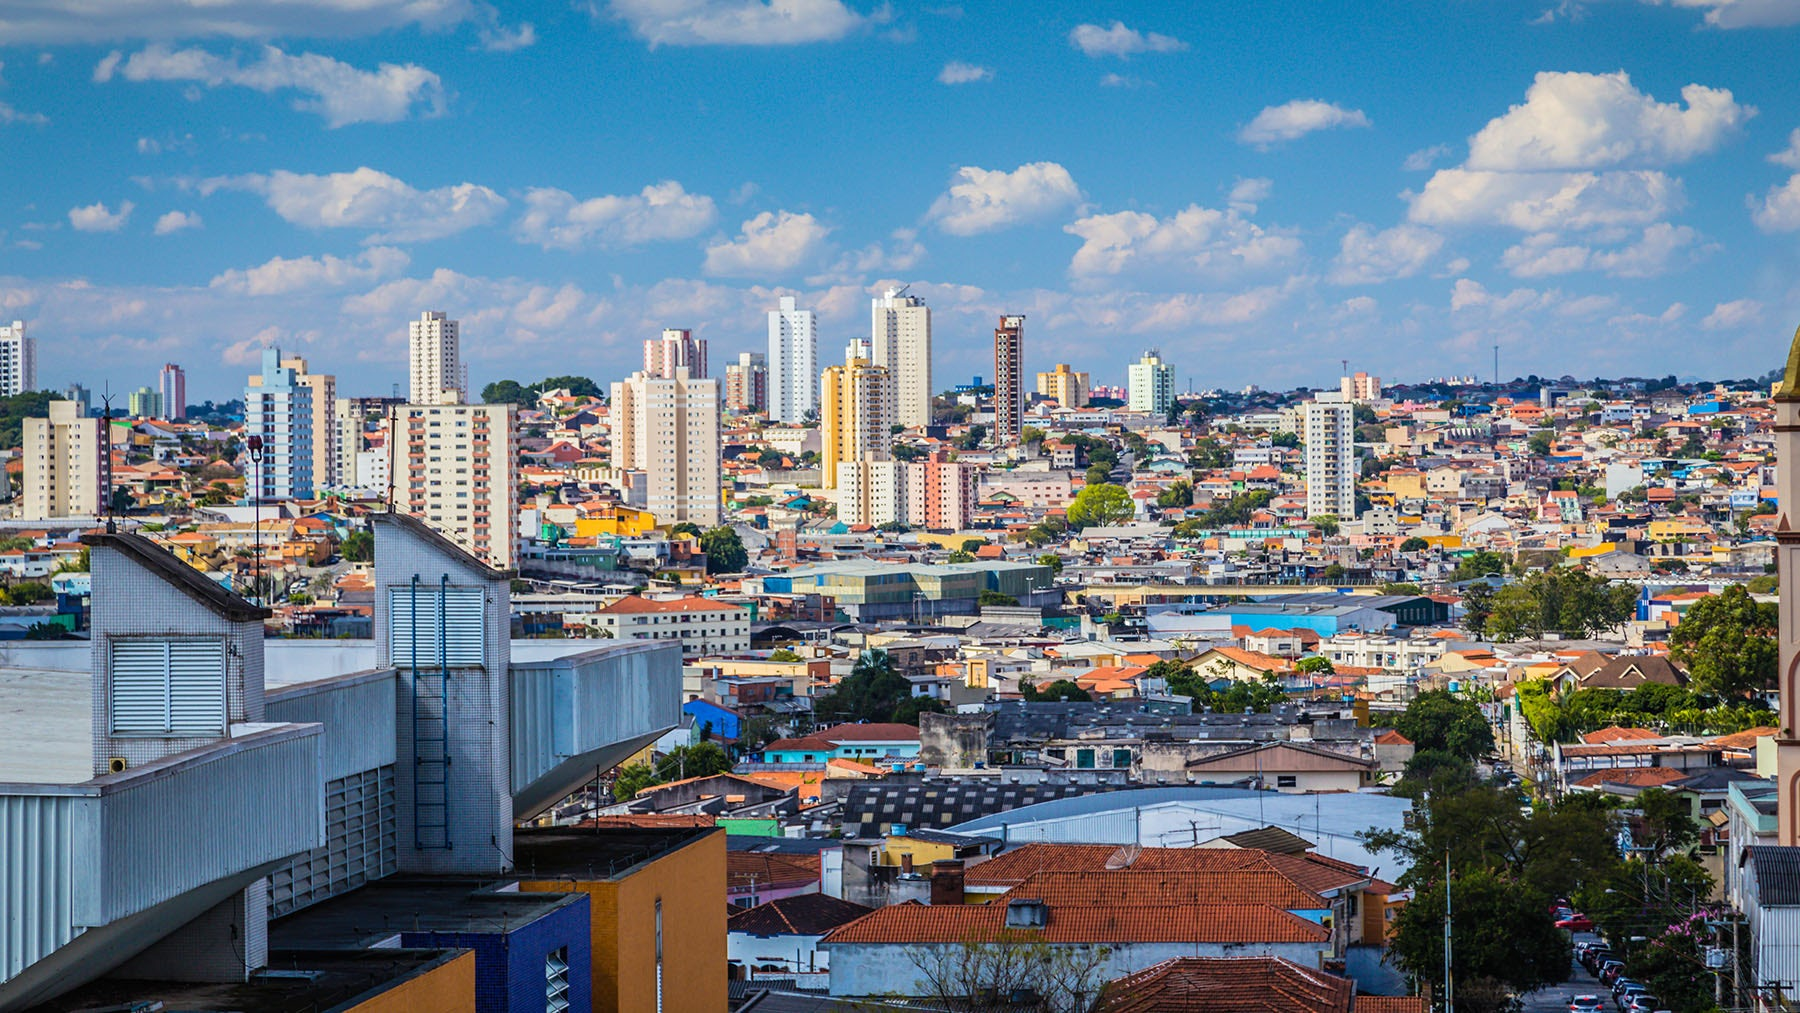 Sao Paulo, Brazil | Source: Shutterstock